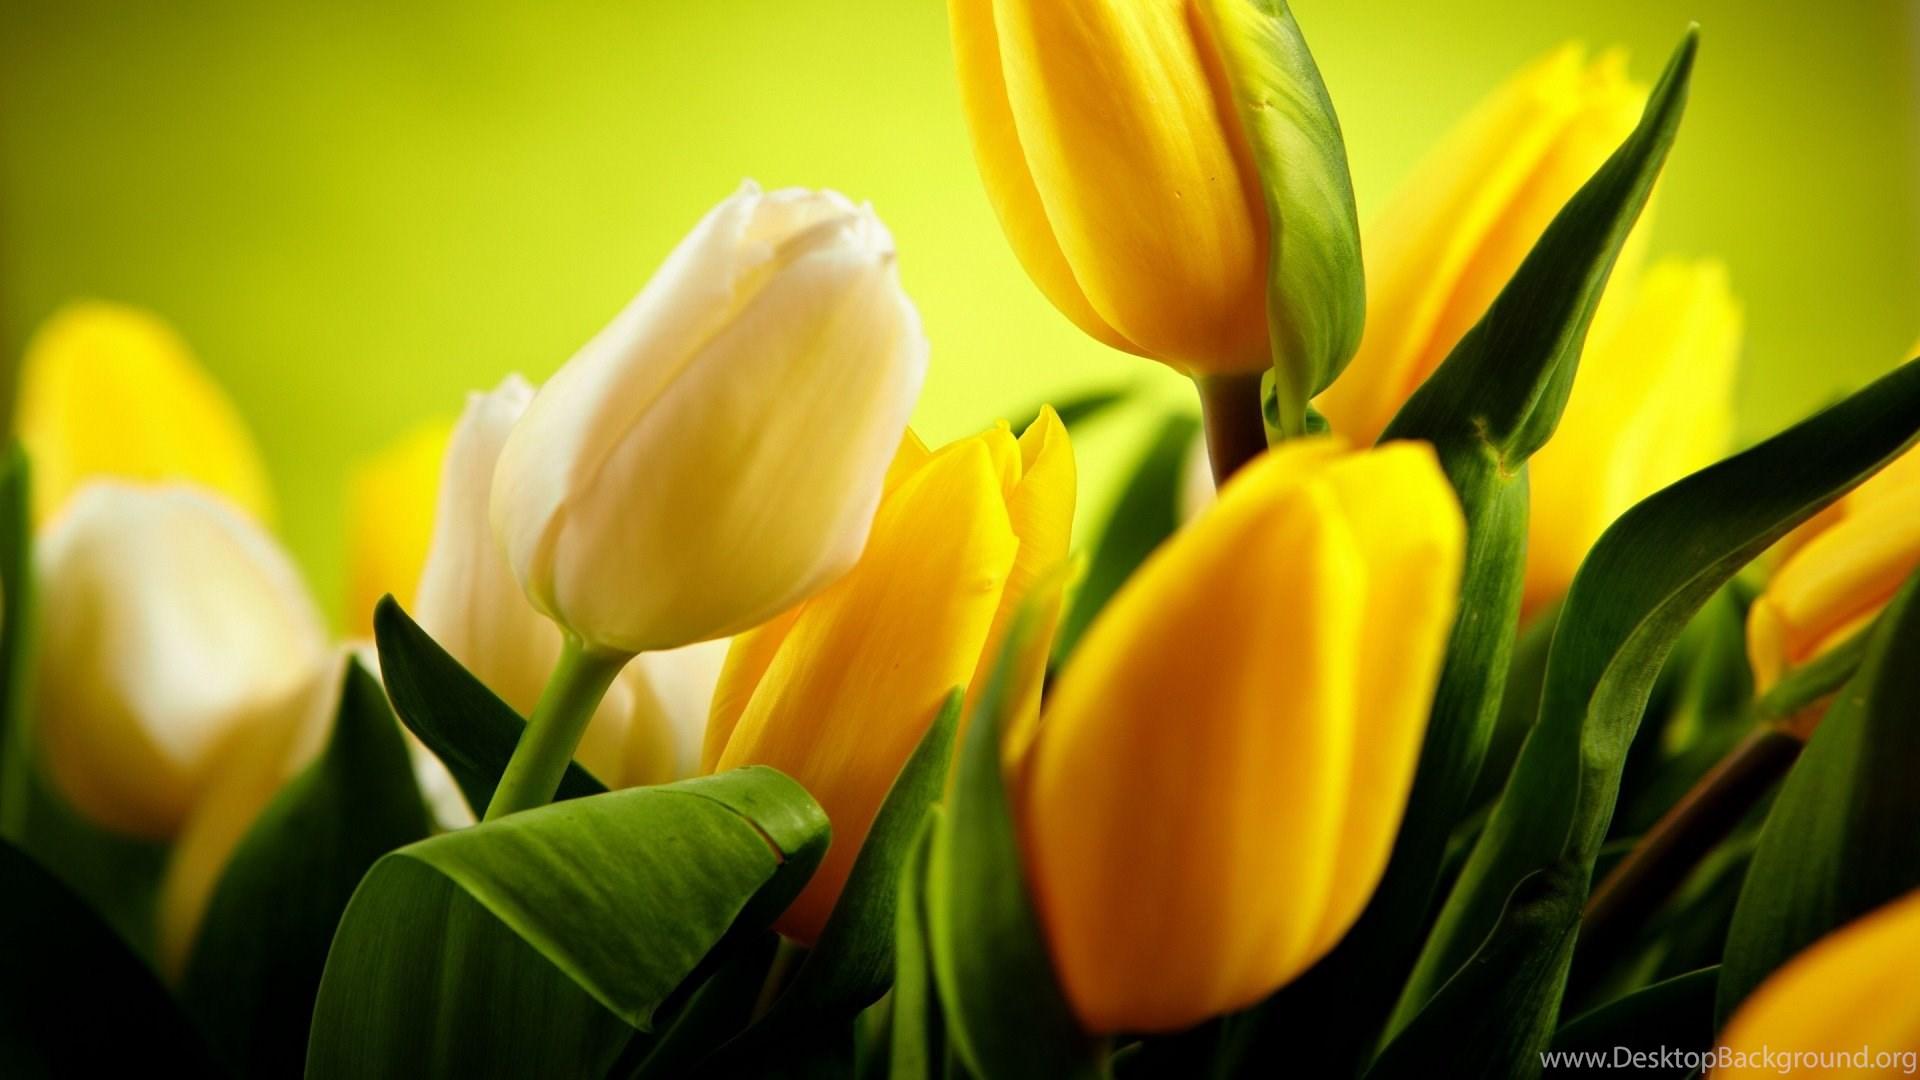 876295 high resolution beautiful flower tulip desktop wallpapers hd 9